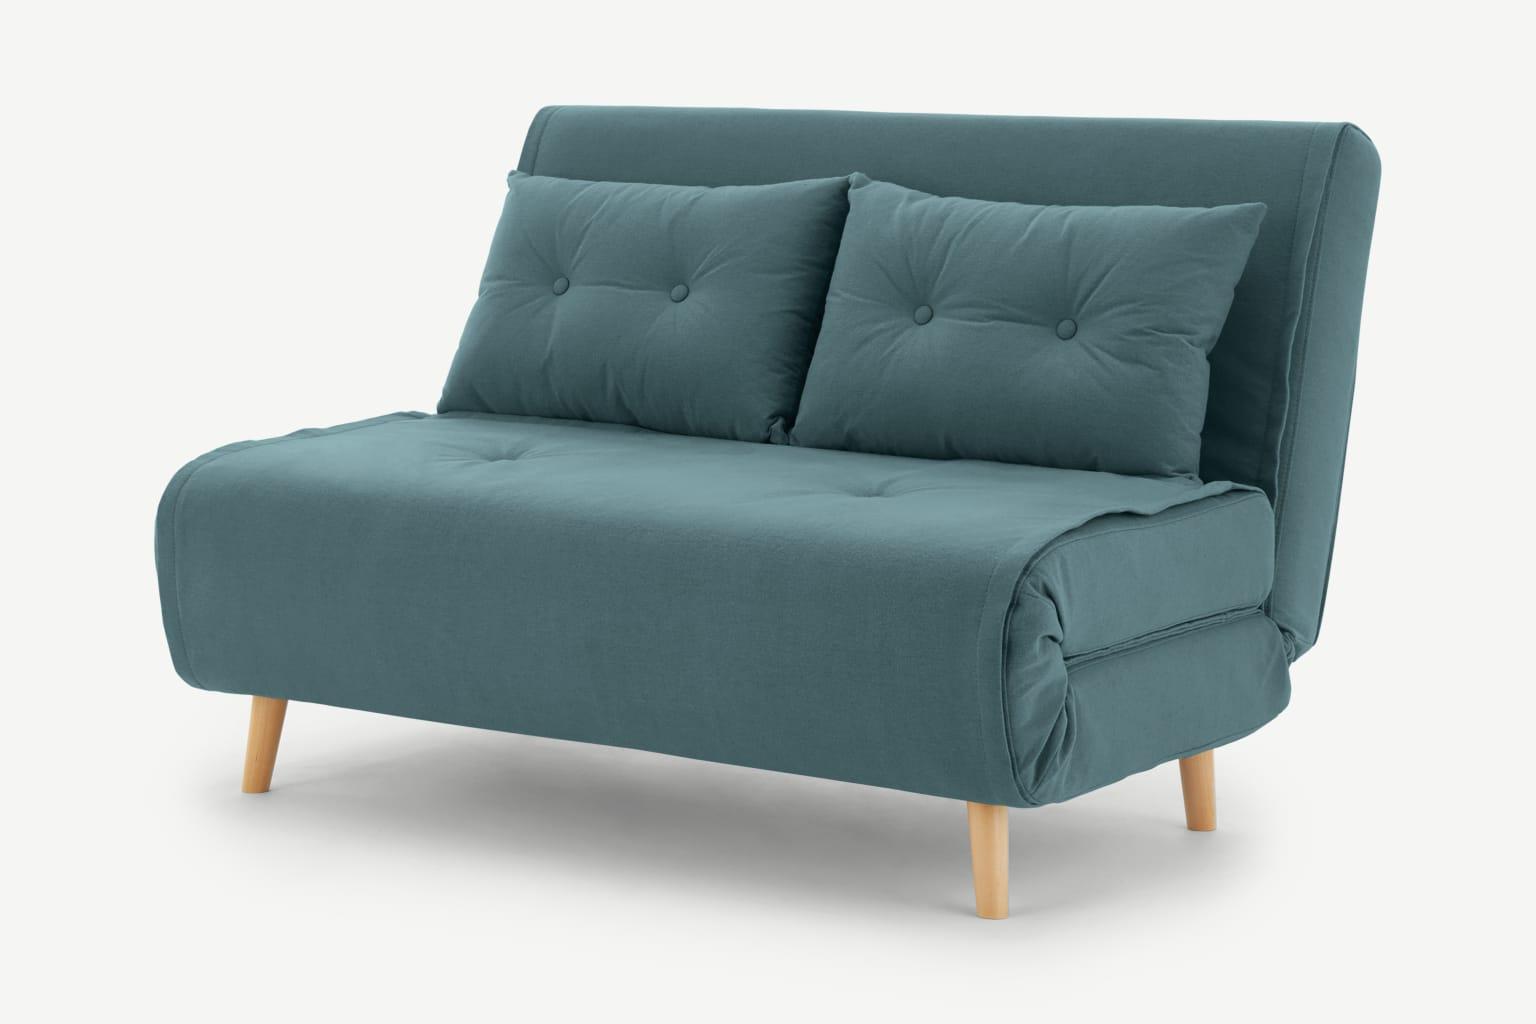 Sofá cama compacto